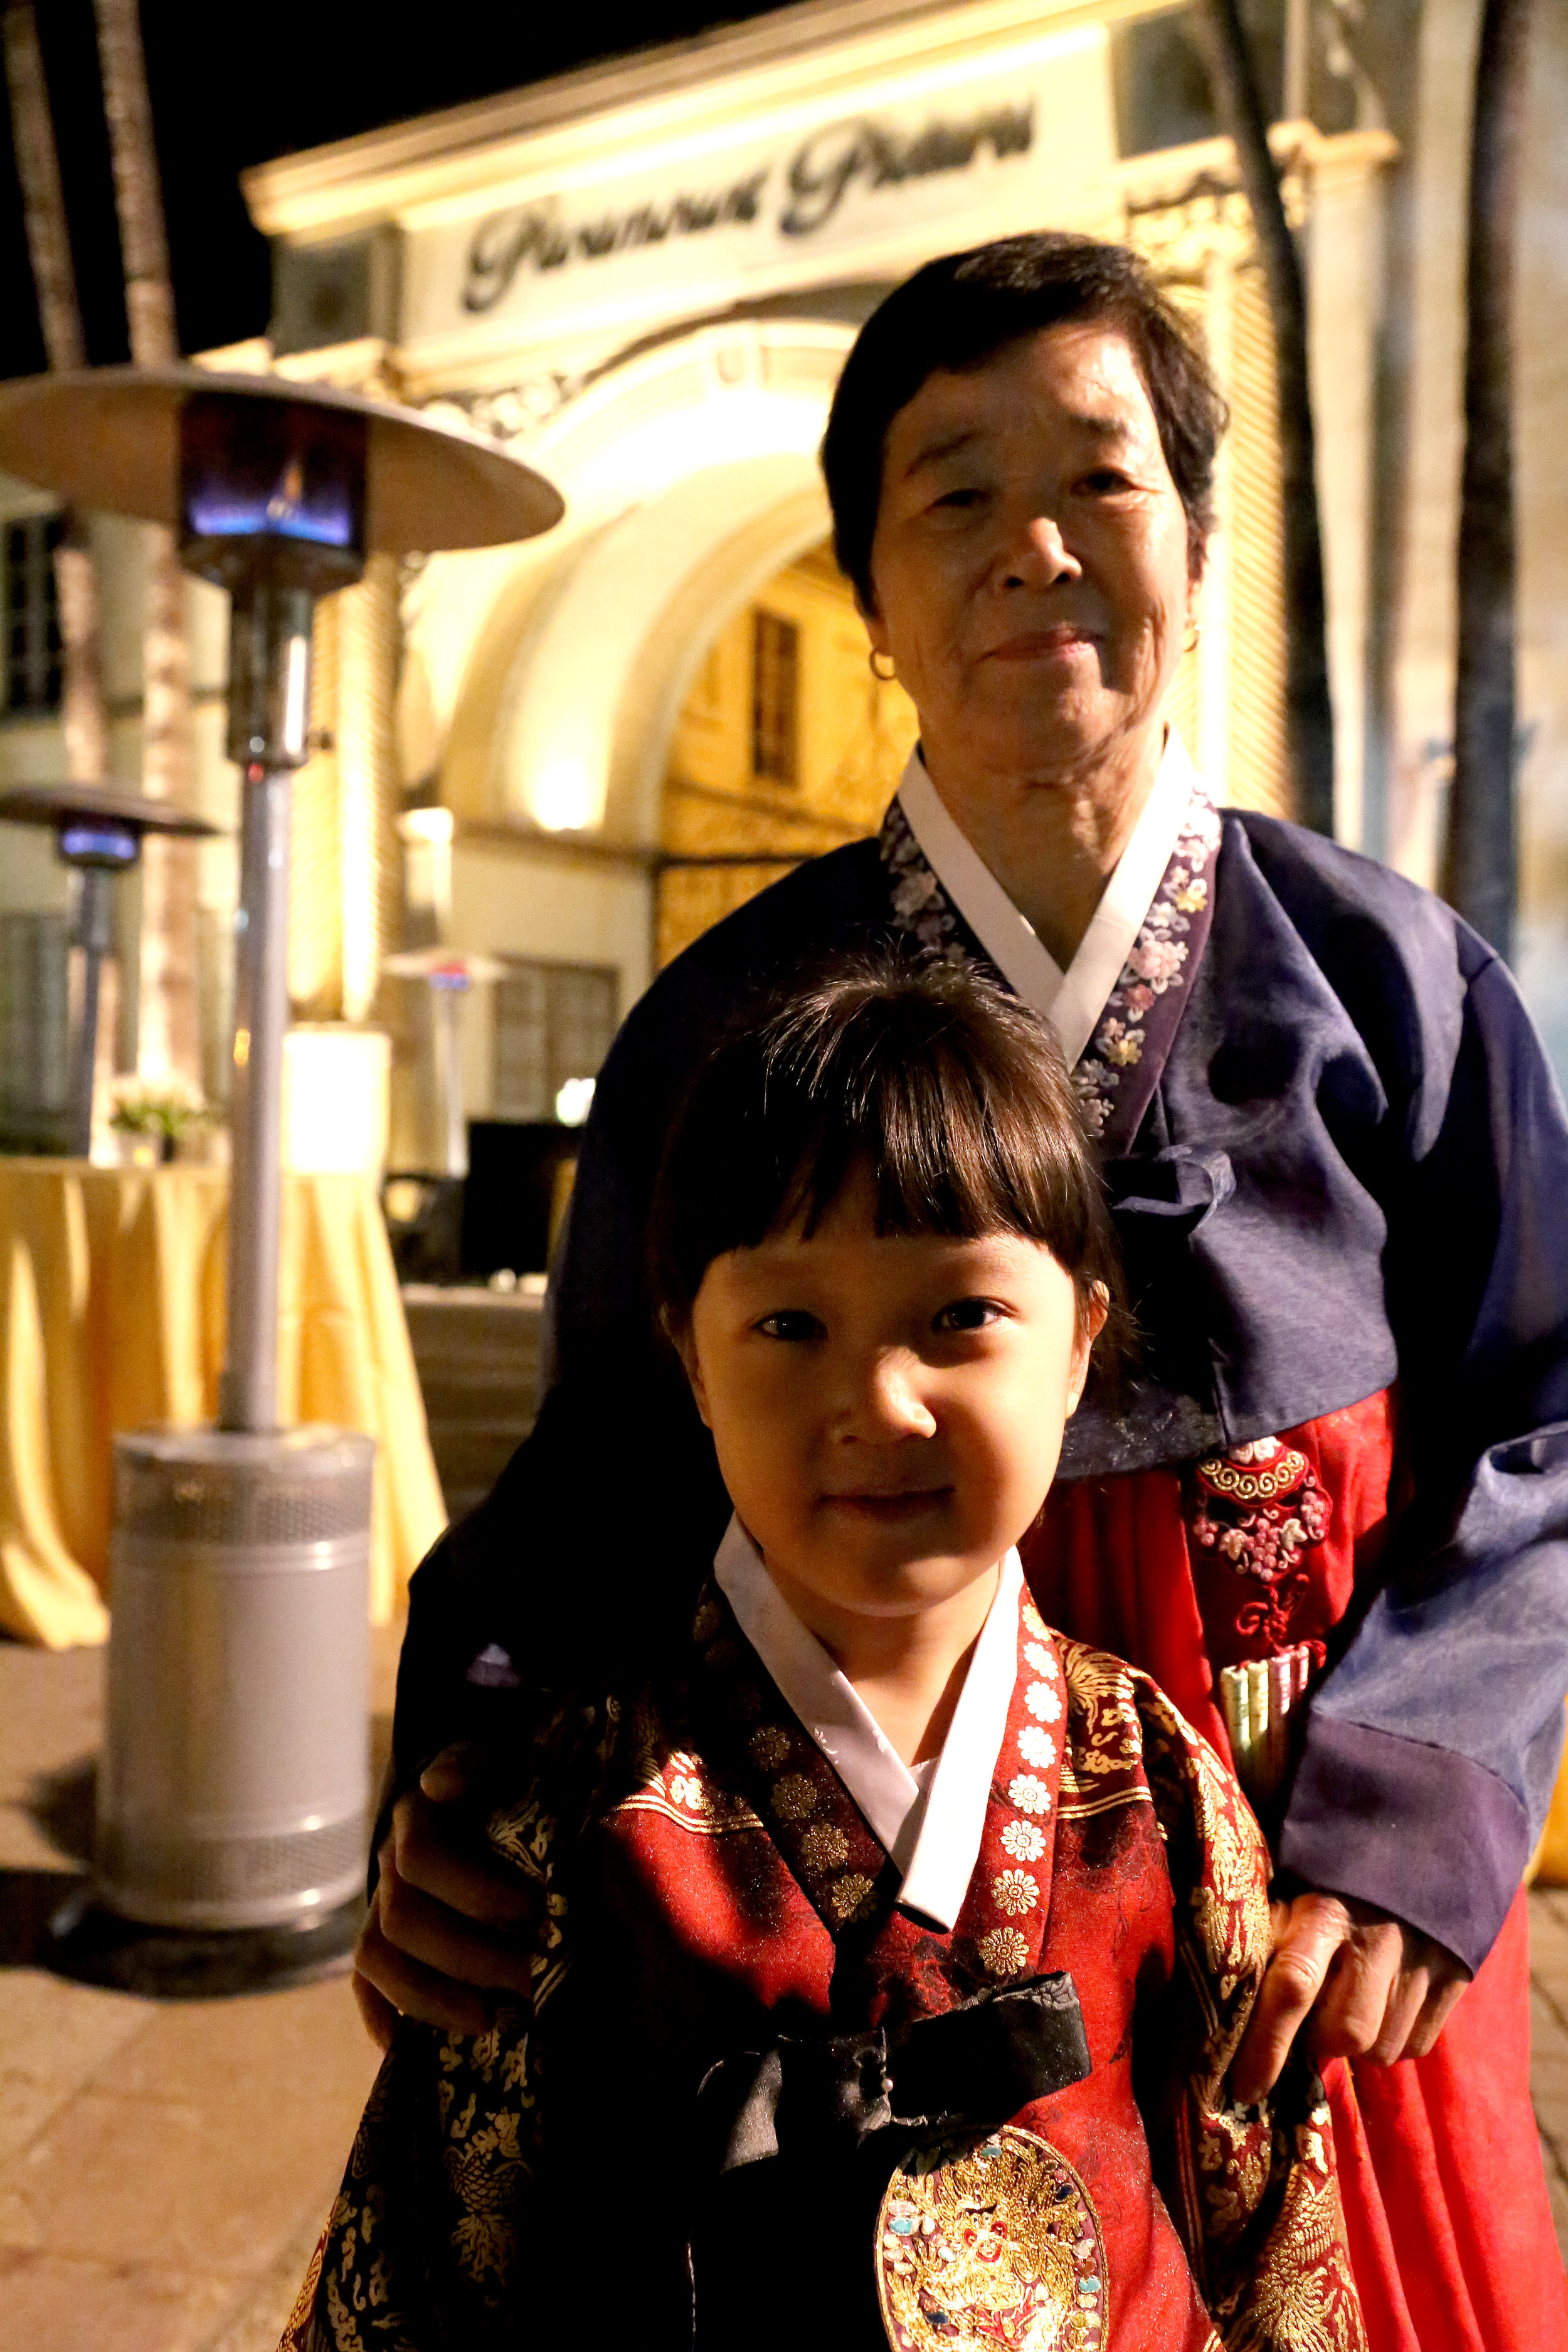 Little child actress, Kim Seol who played Ayla